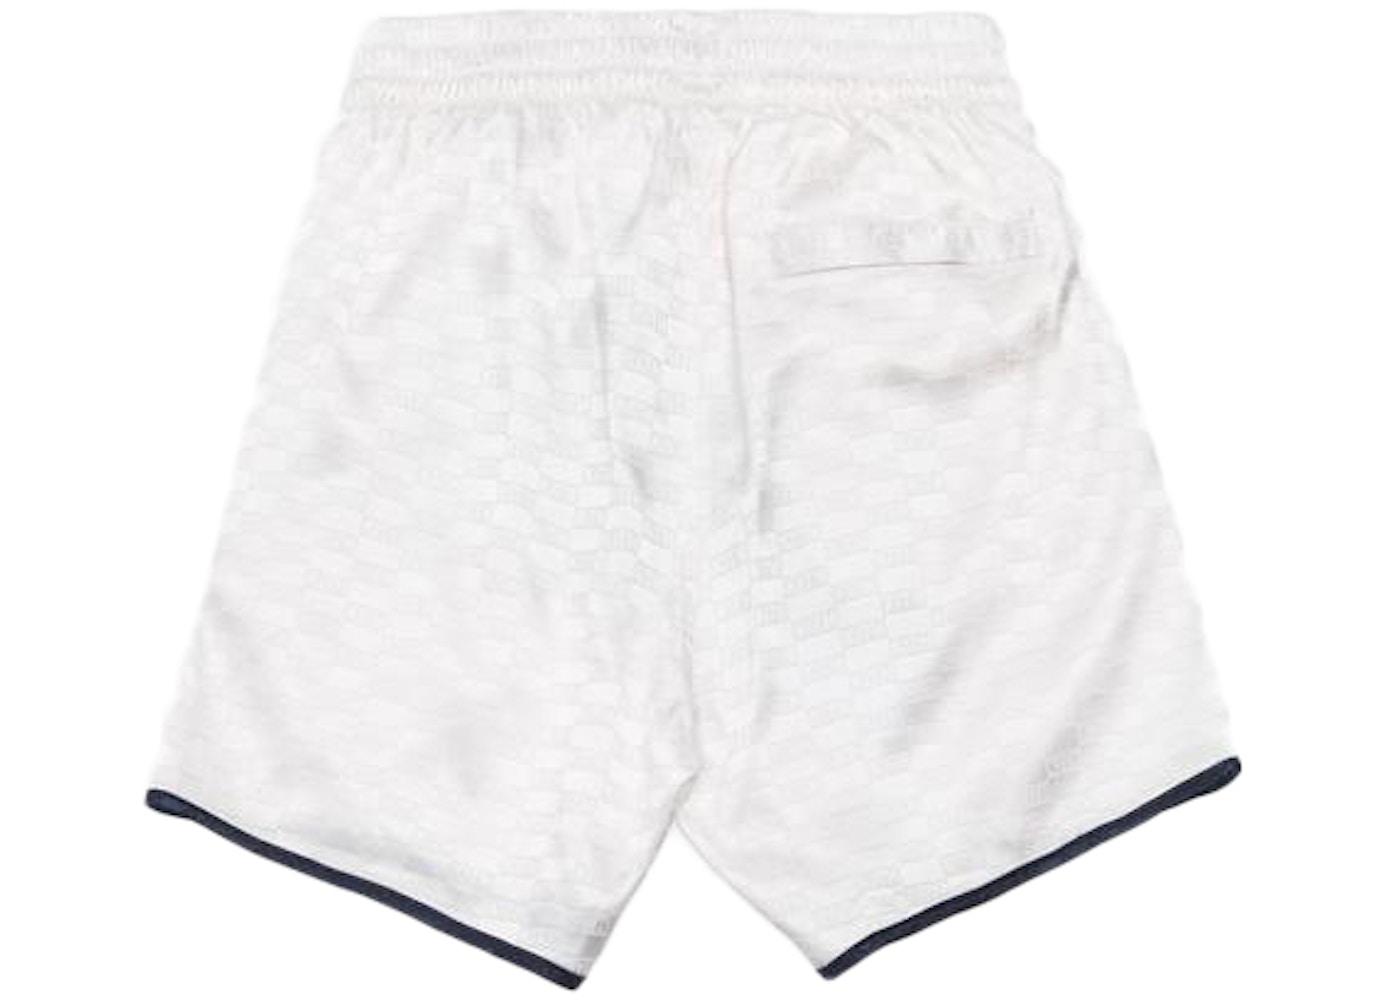 c4878d82e4d8 Streetwear - Kith Bottoms - New Lowest Asks